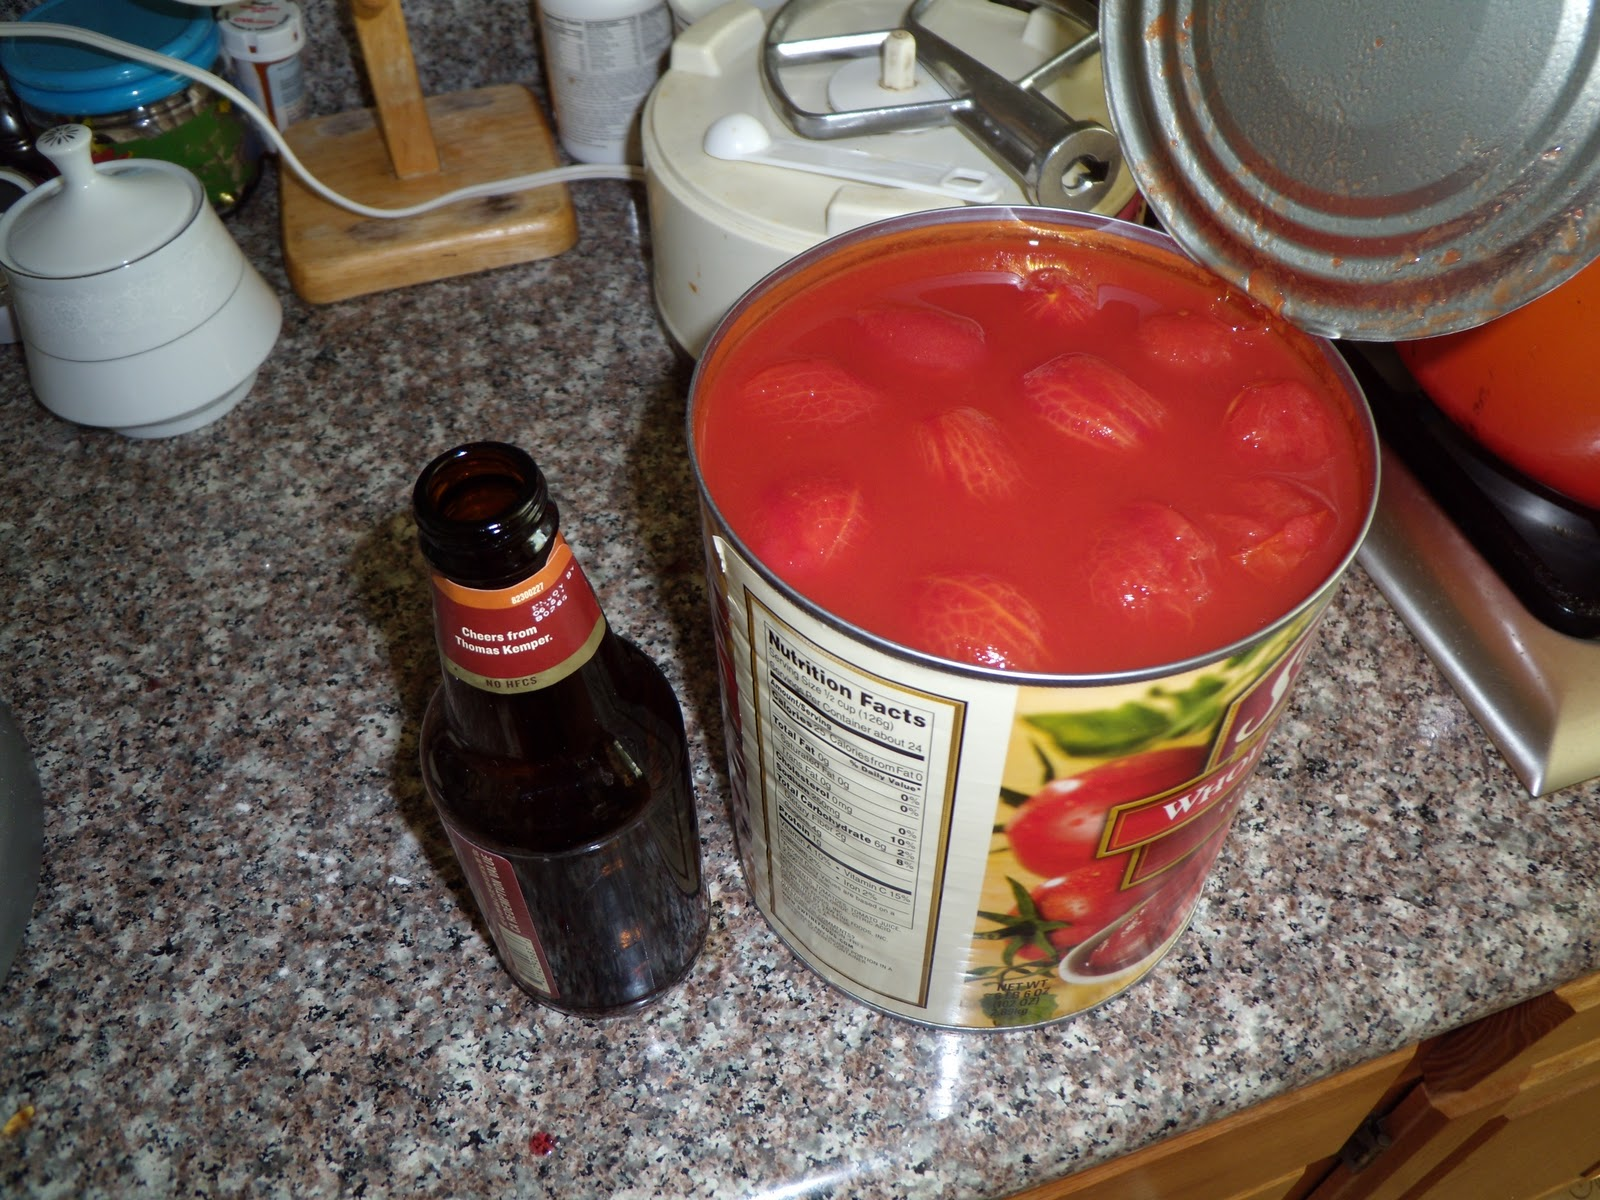 Kitchenaid Attachment Food Processor For Kitchen Aid Mixer